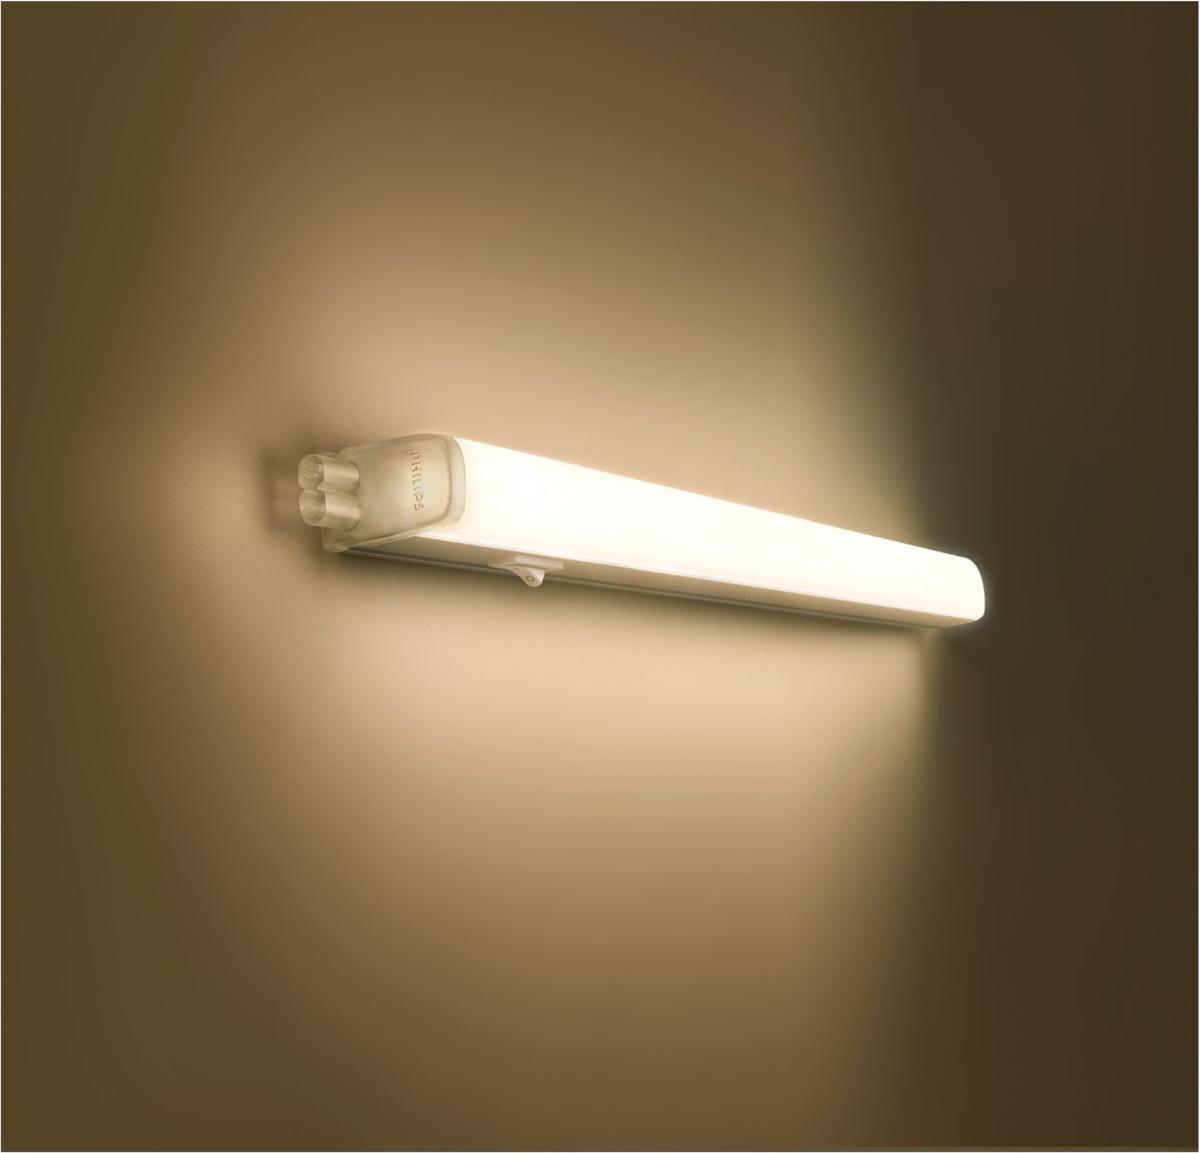 Philips LED Leuchtstoffröhre 33cm 3,2W Trunklinea Tageslicht 31236/31/P3